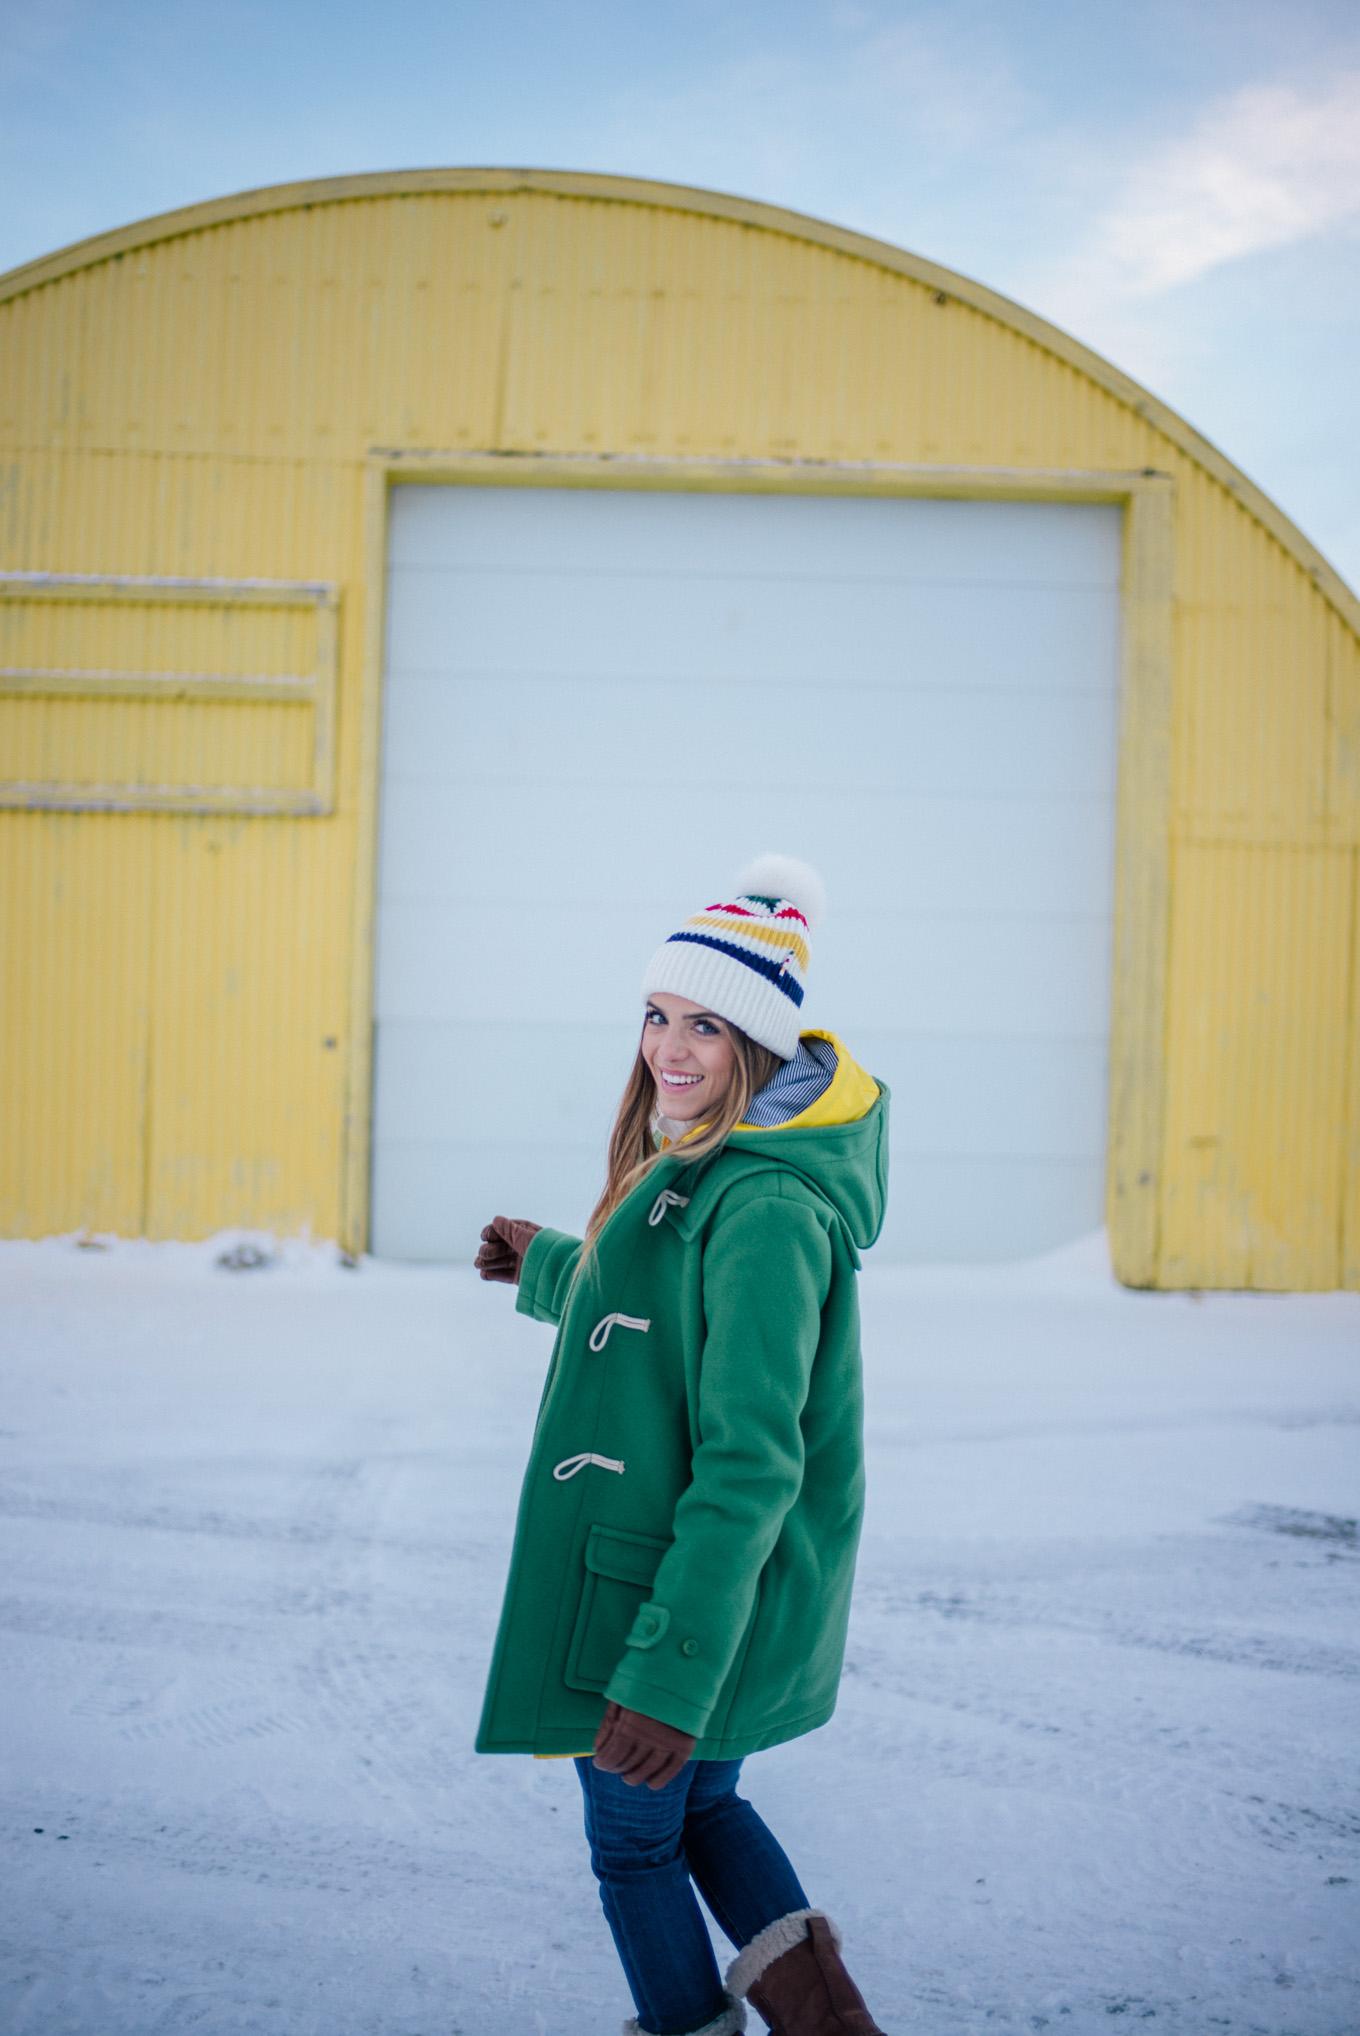 gmg-iceland-roadtrip-1005246